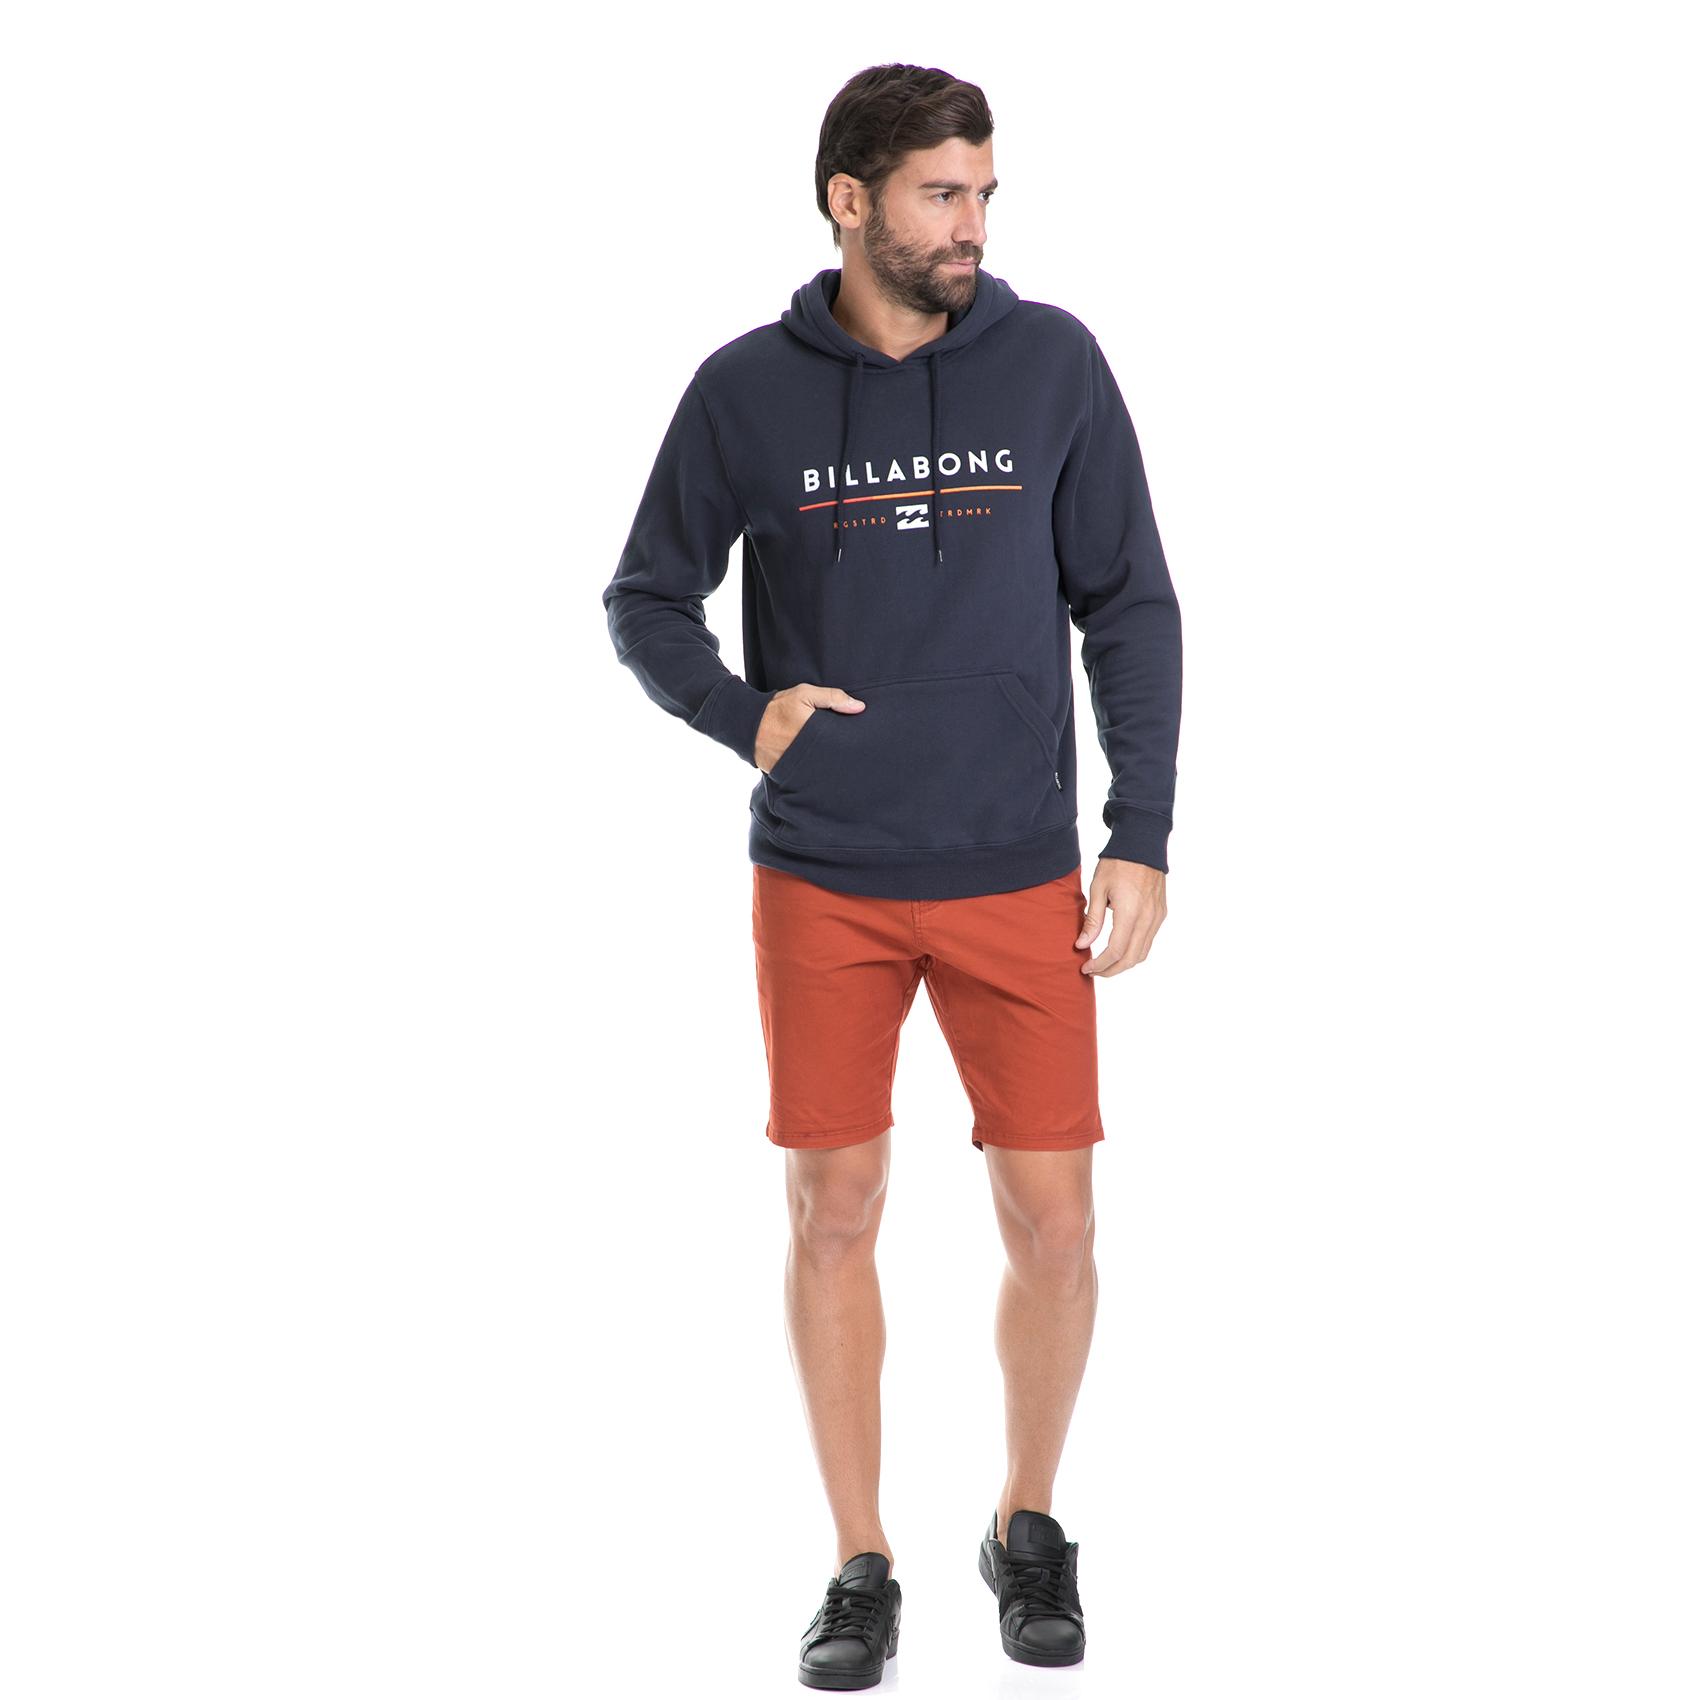 ELEMENT – Ανδρική βερμούδα ELEMENT πορτοκαλί